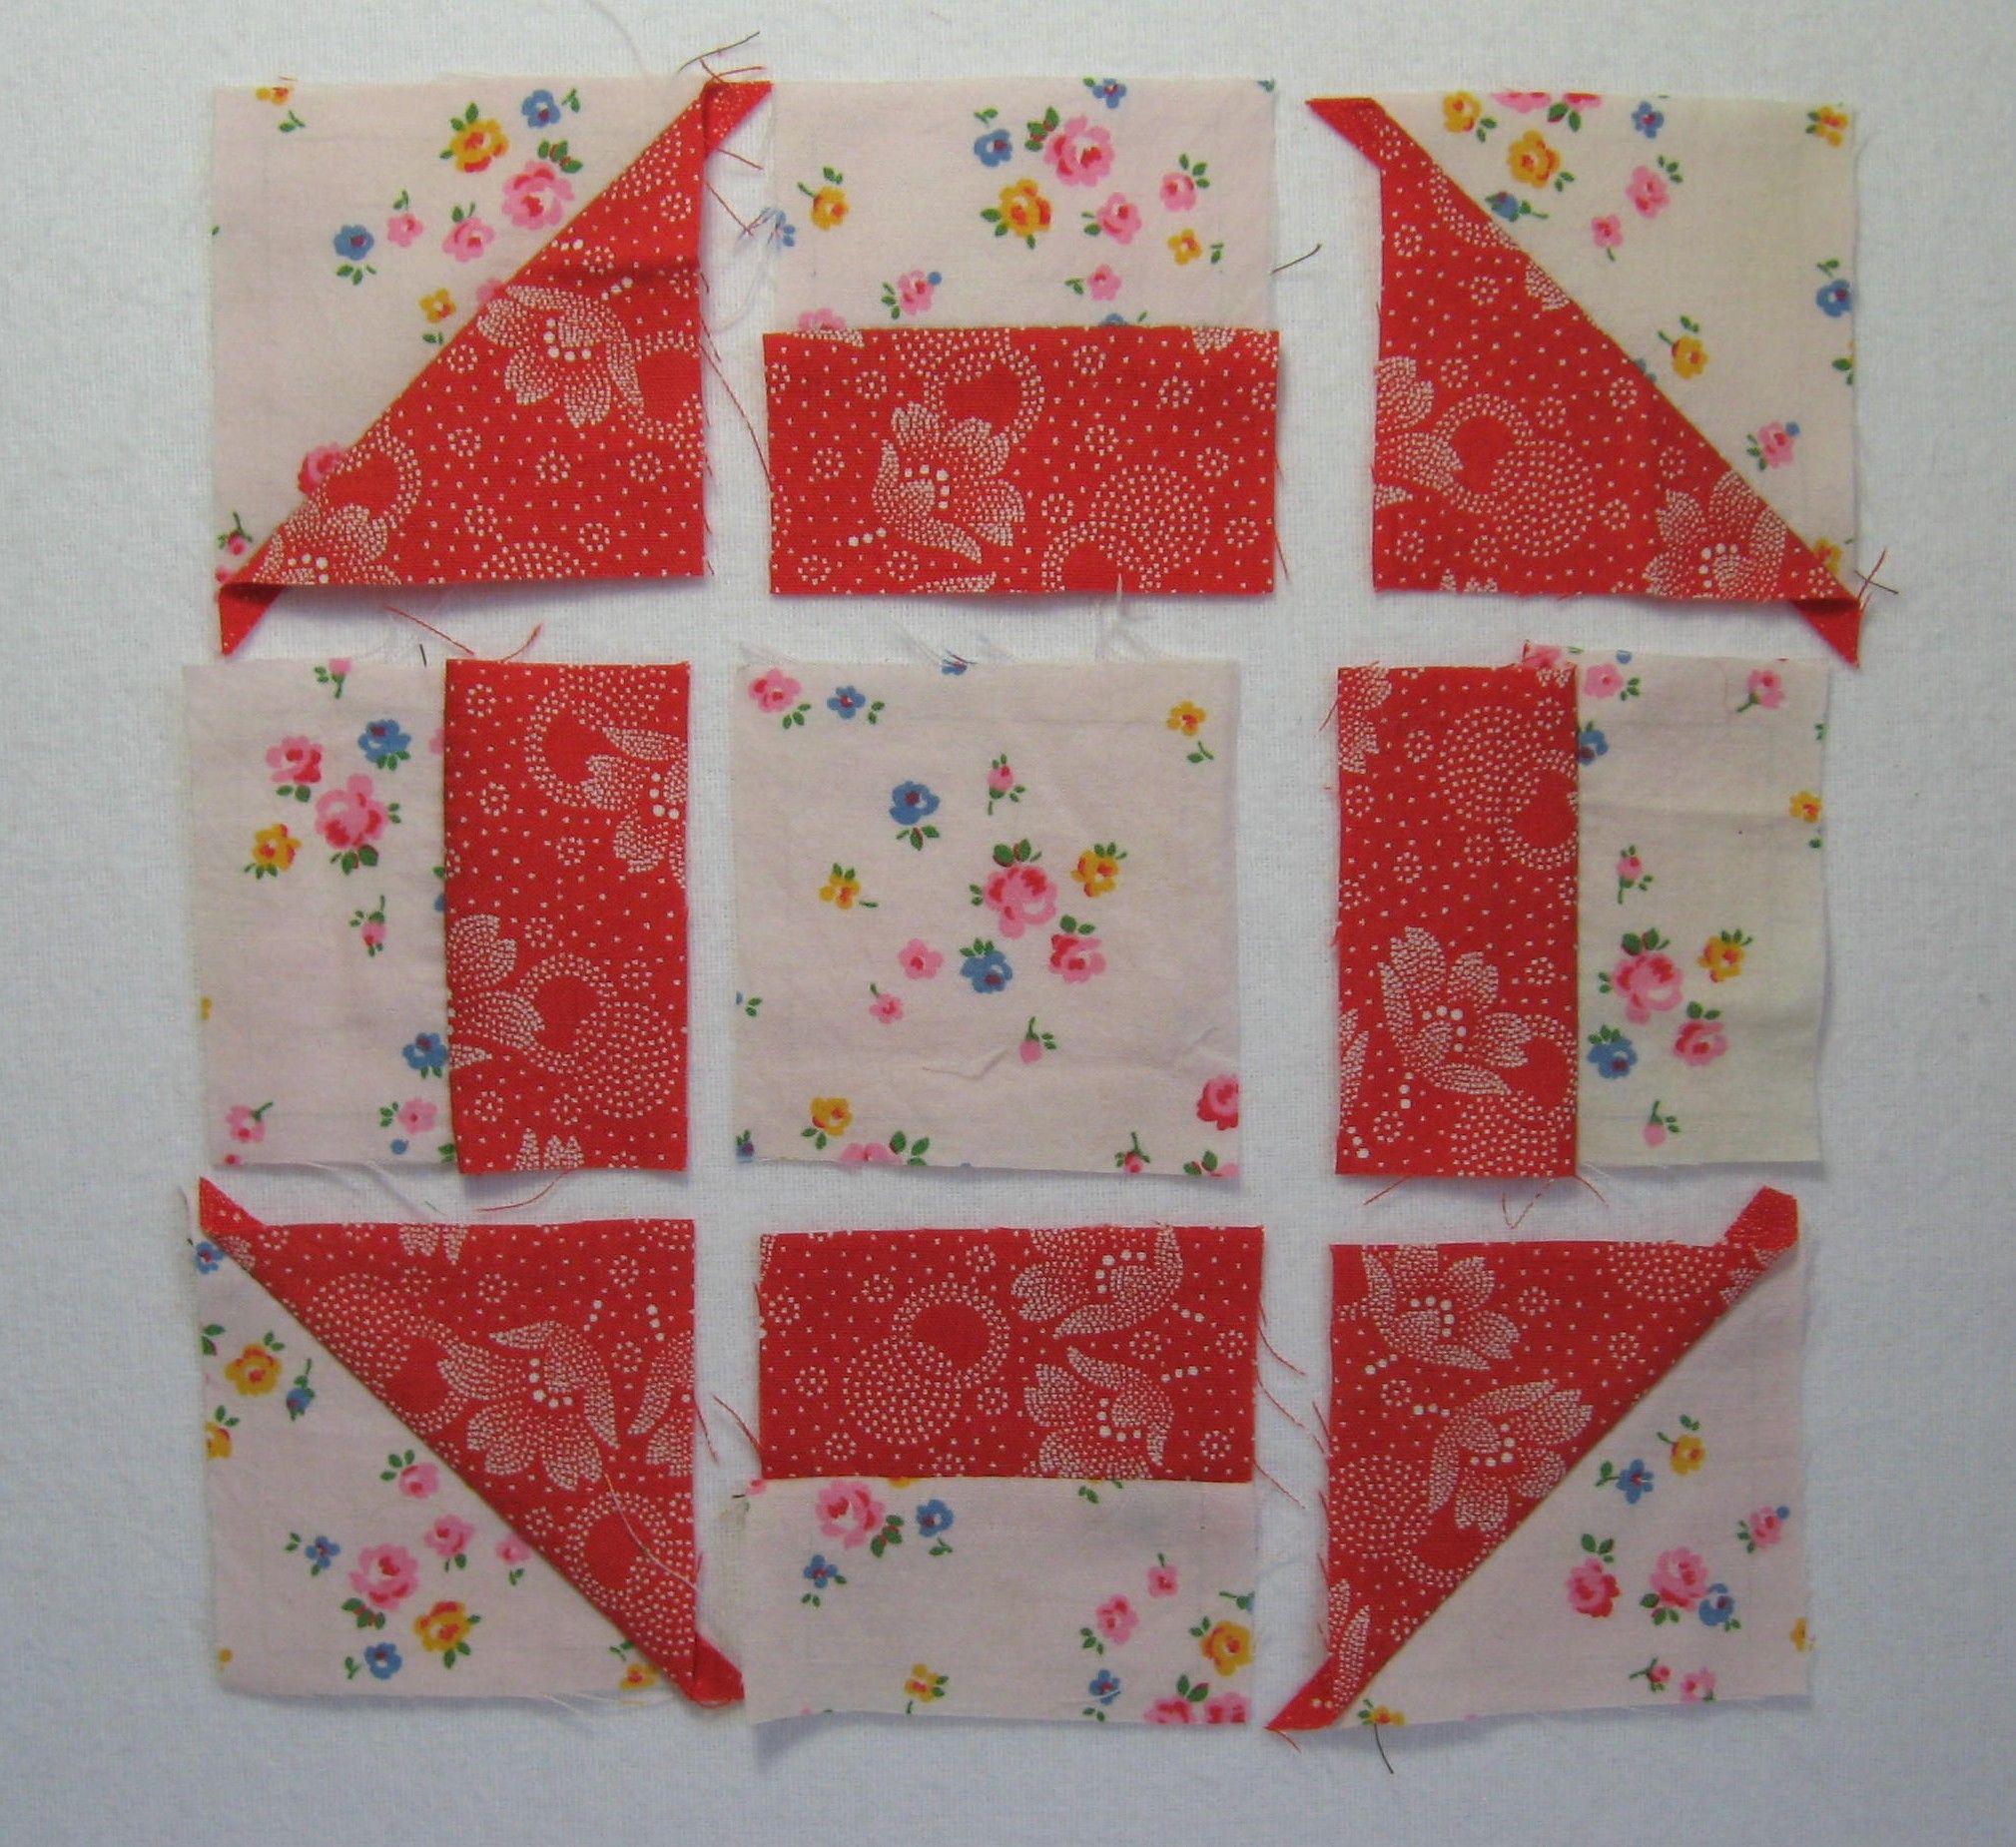 Churn Dash quilt block | Churn dash quilt and Patterns : churn dash quilt block pattern - Adamdwight.com